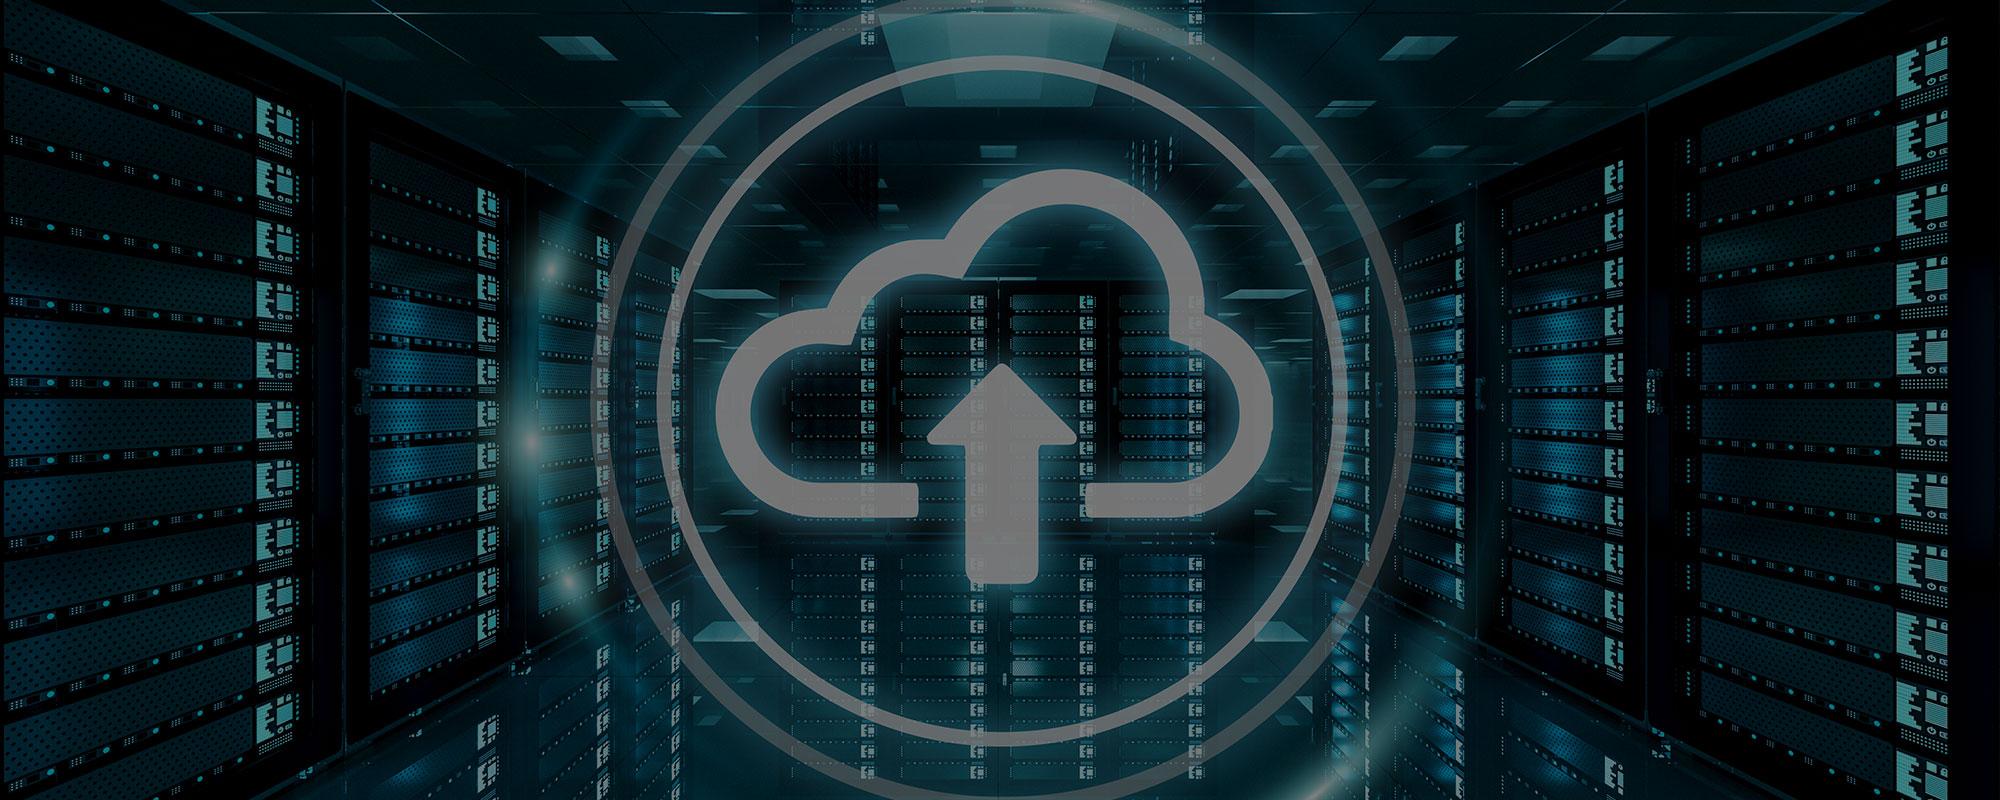 SD-WAN Cloud Connectivity